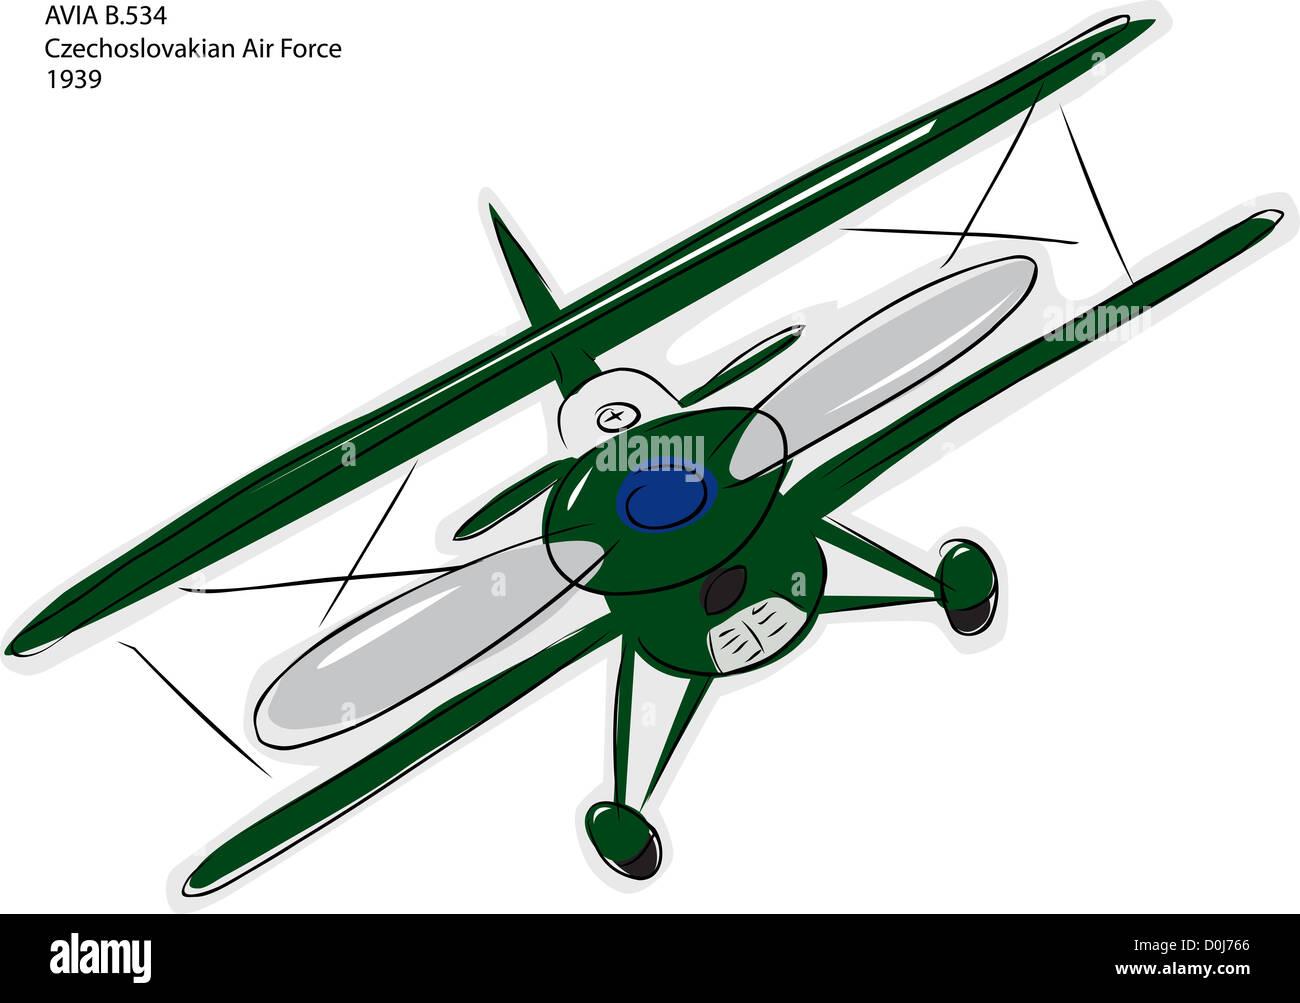 Sketch of Avia B.534 World War II combat bi-plane over white - Stock Image